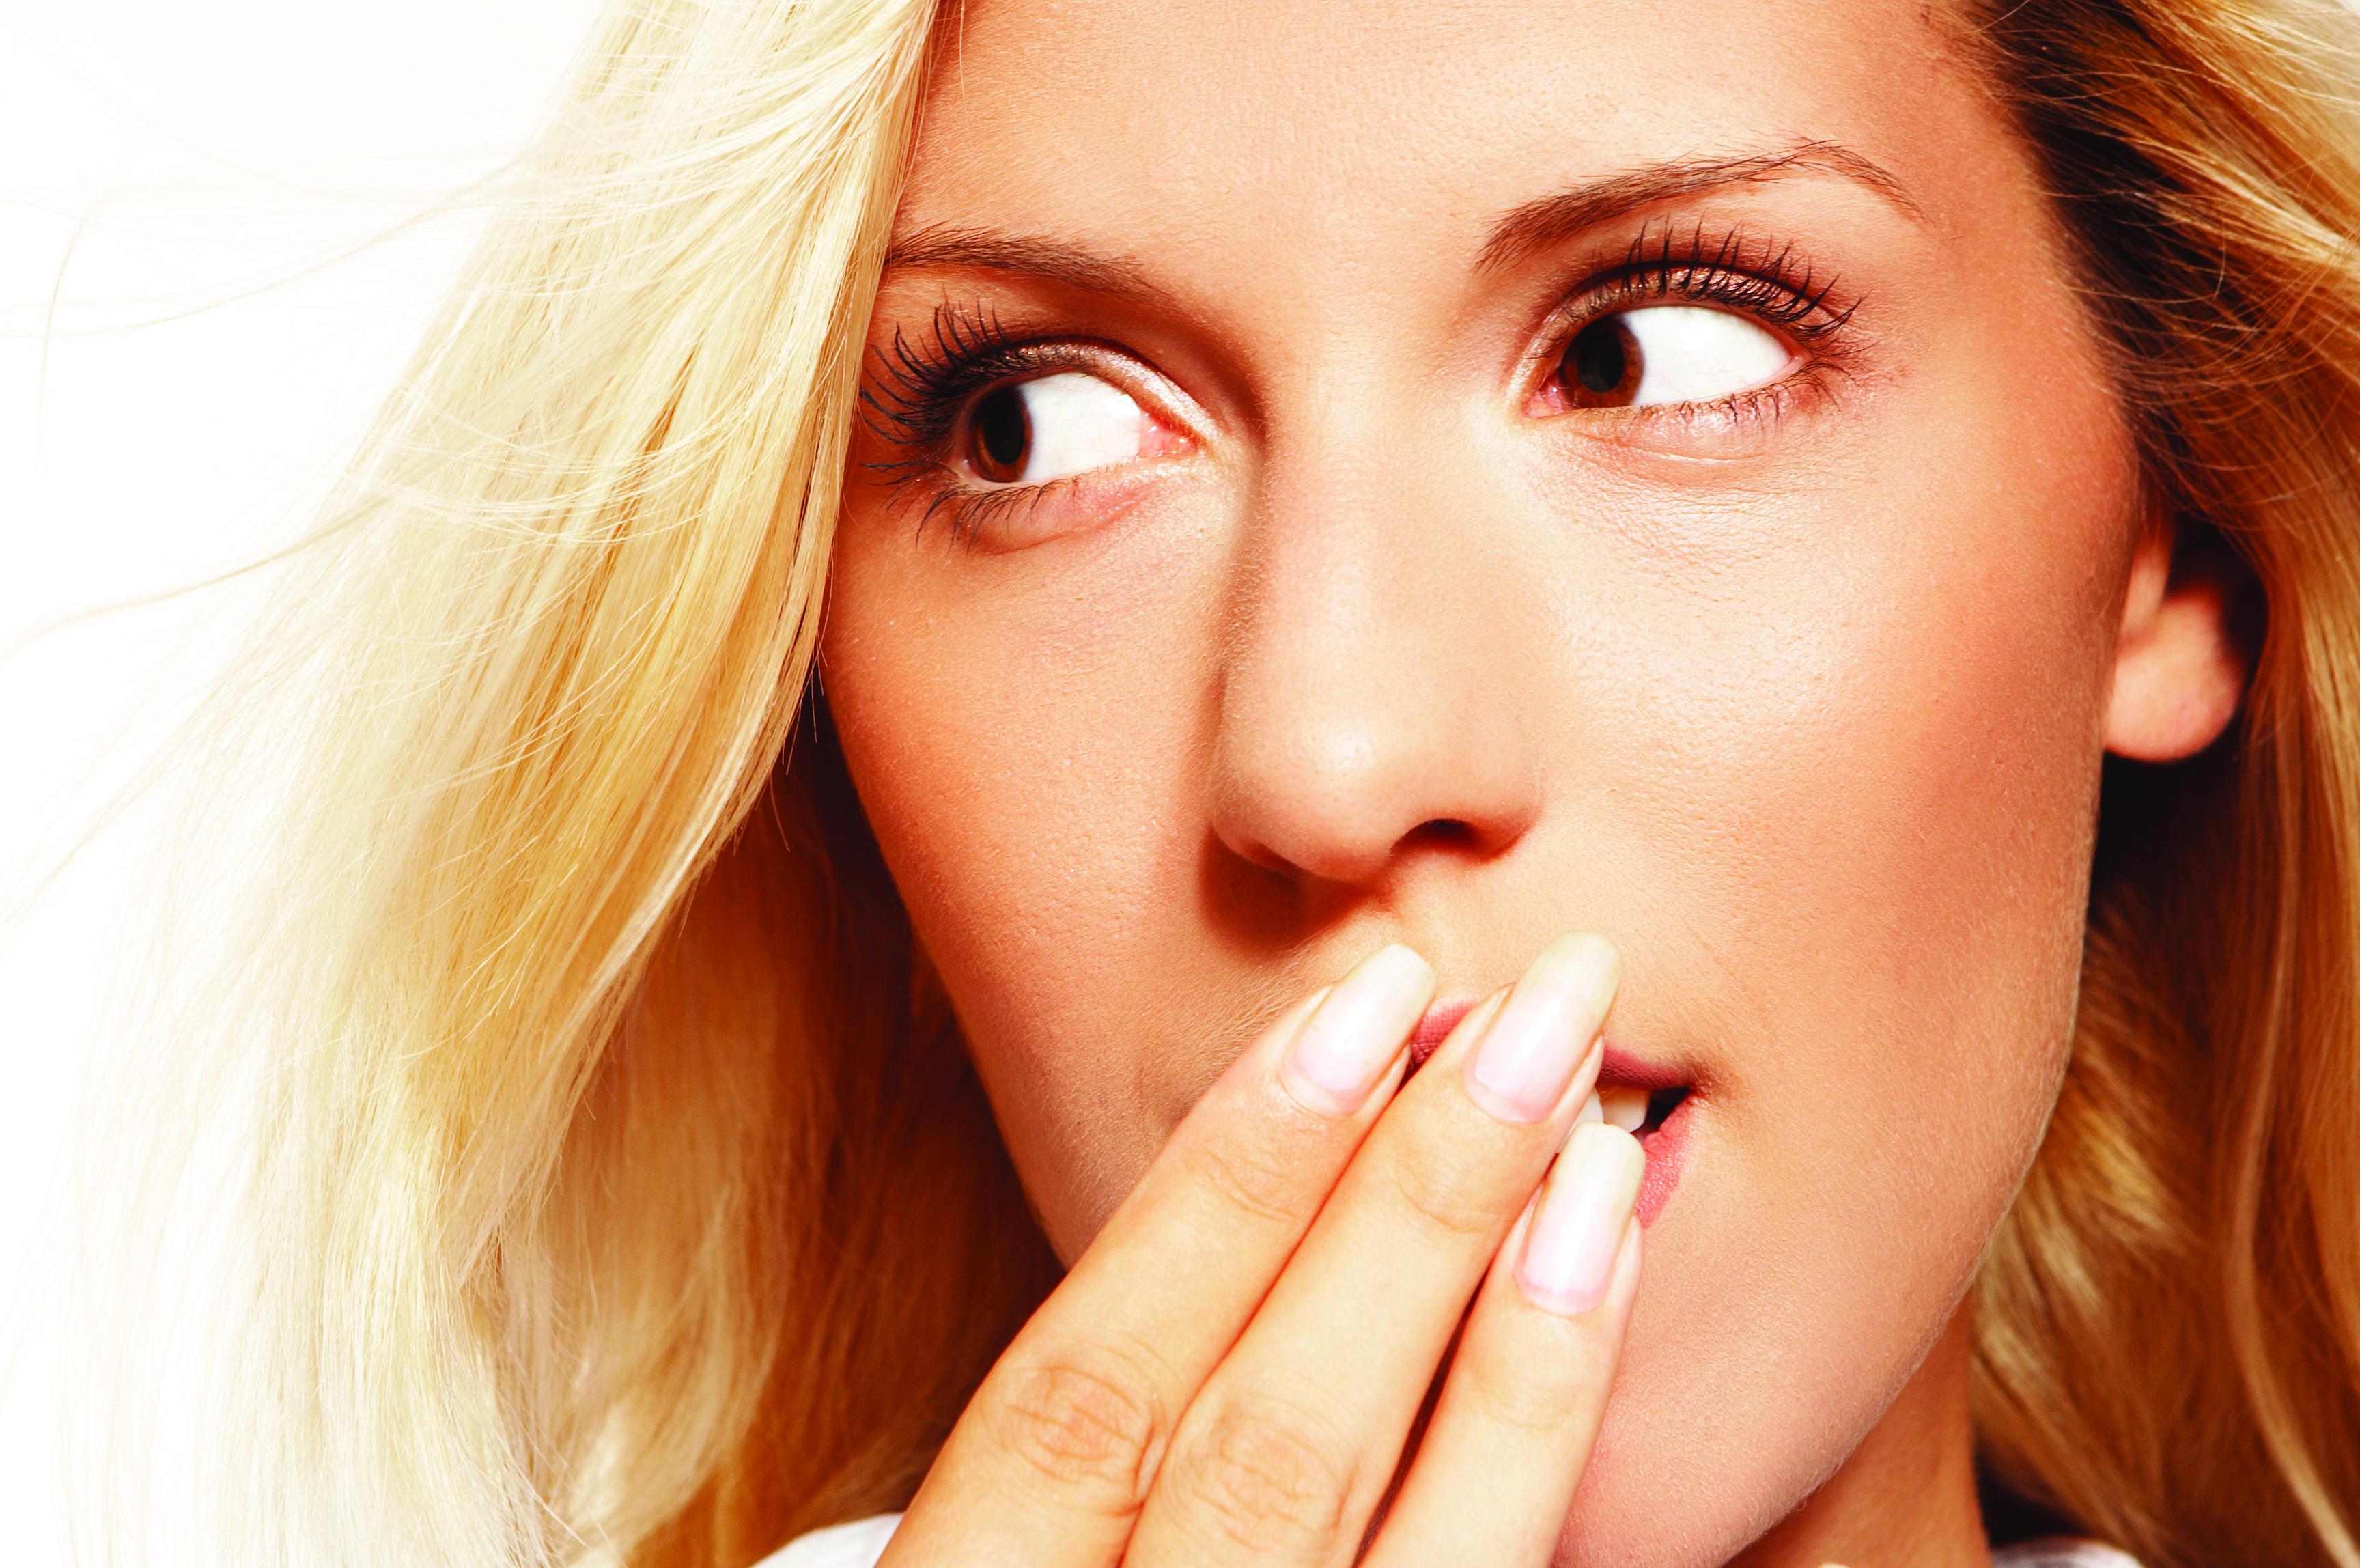 Woman hiding teeth.jpg